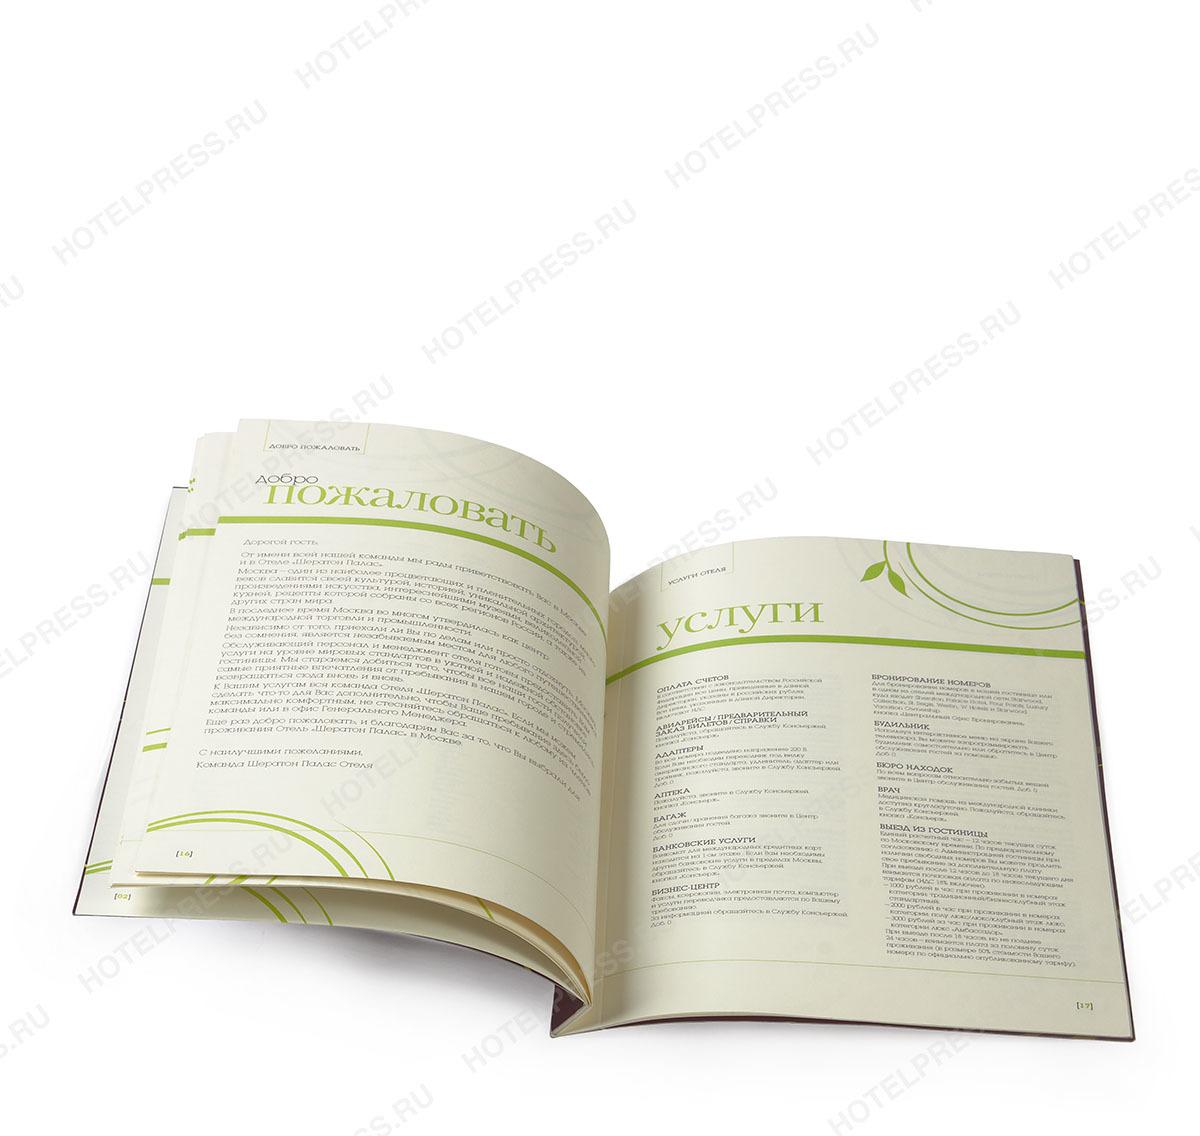 Папка рум сервис из синтетической бумаги МРС_4